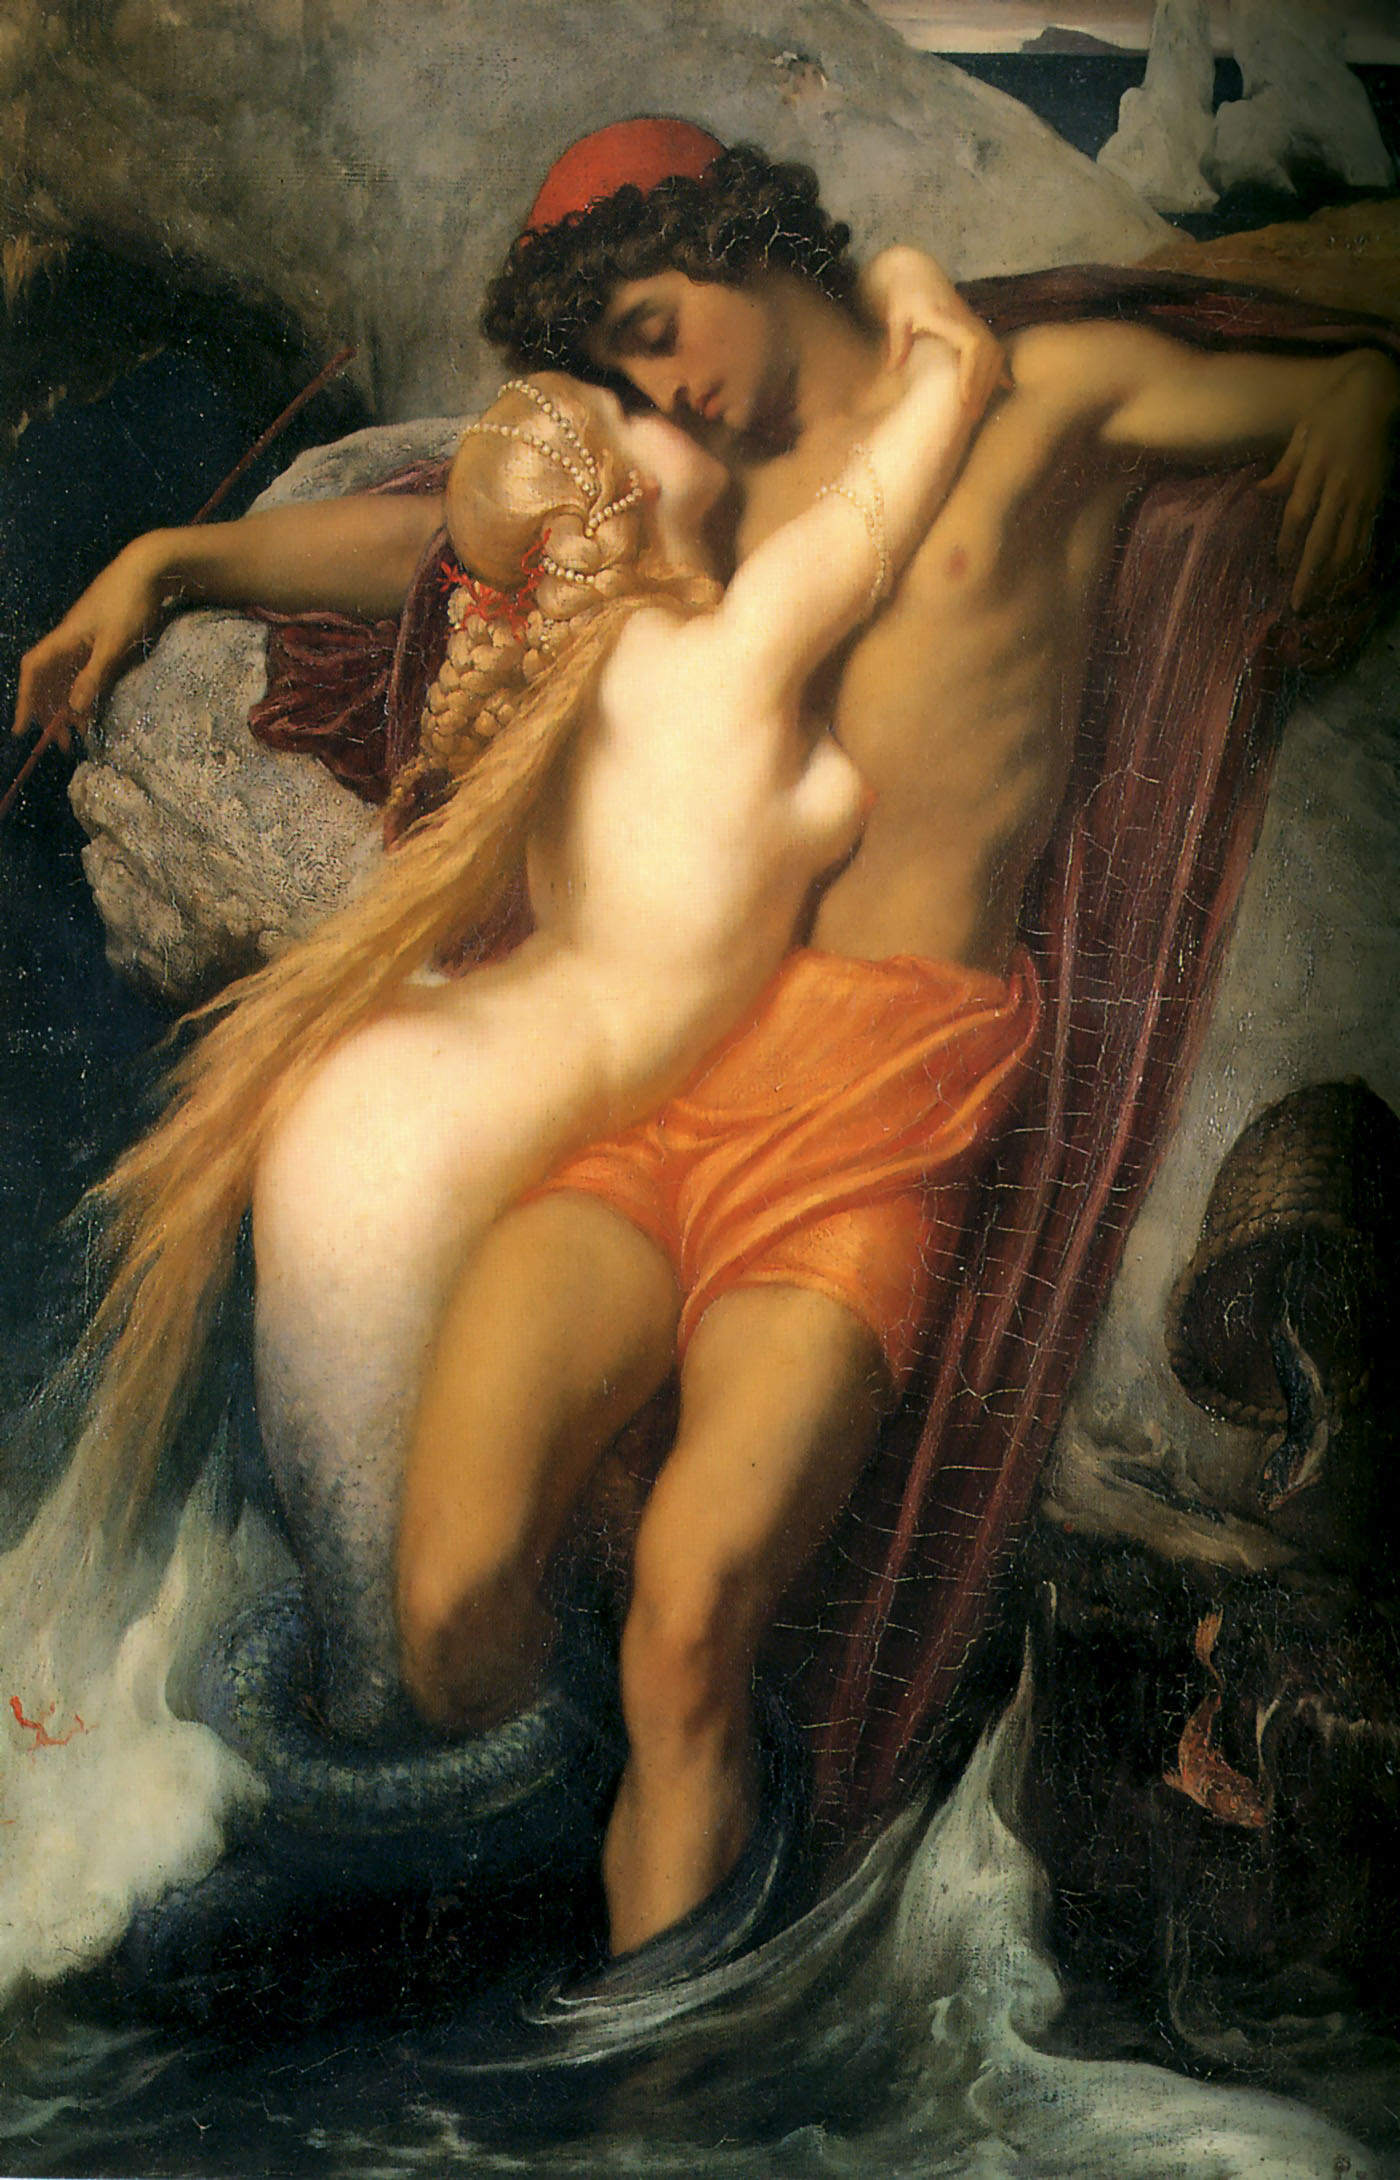 Frederick Leighton, 1830-1896. Рыбак и сирена. 1856-1858. 66.3 х 48.7 см. Частная коллекция